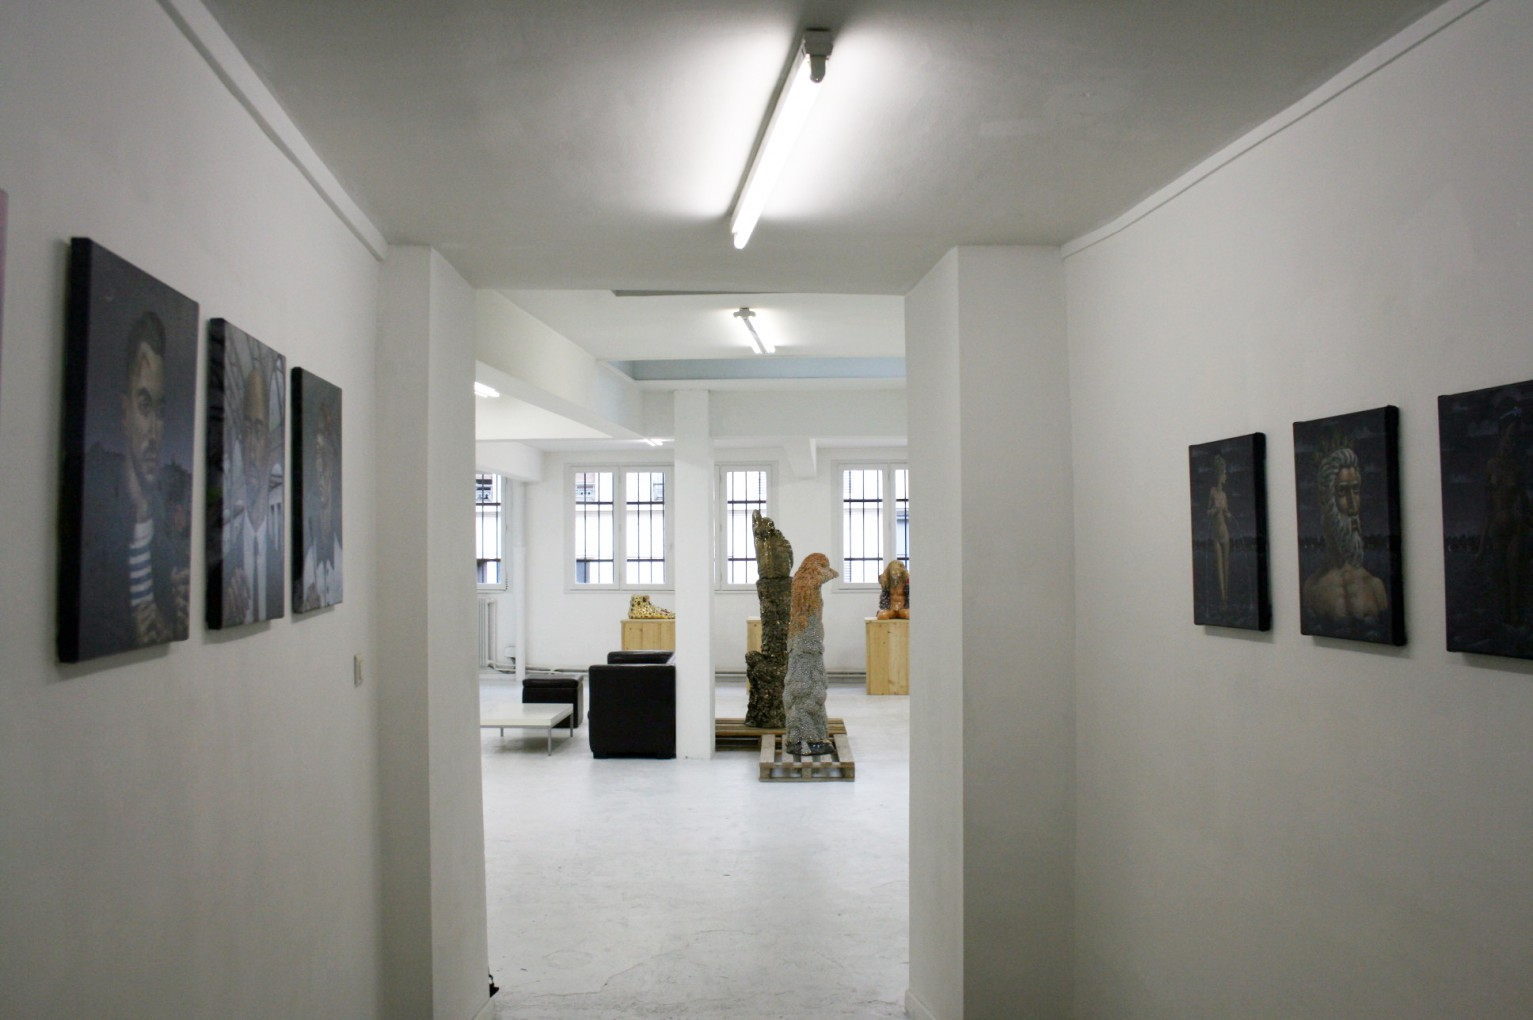 Exhibiton View Trinity: Homage to the Illogical